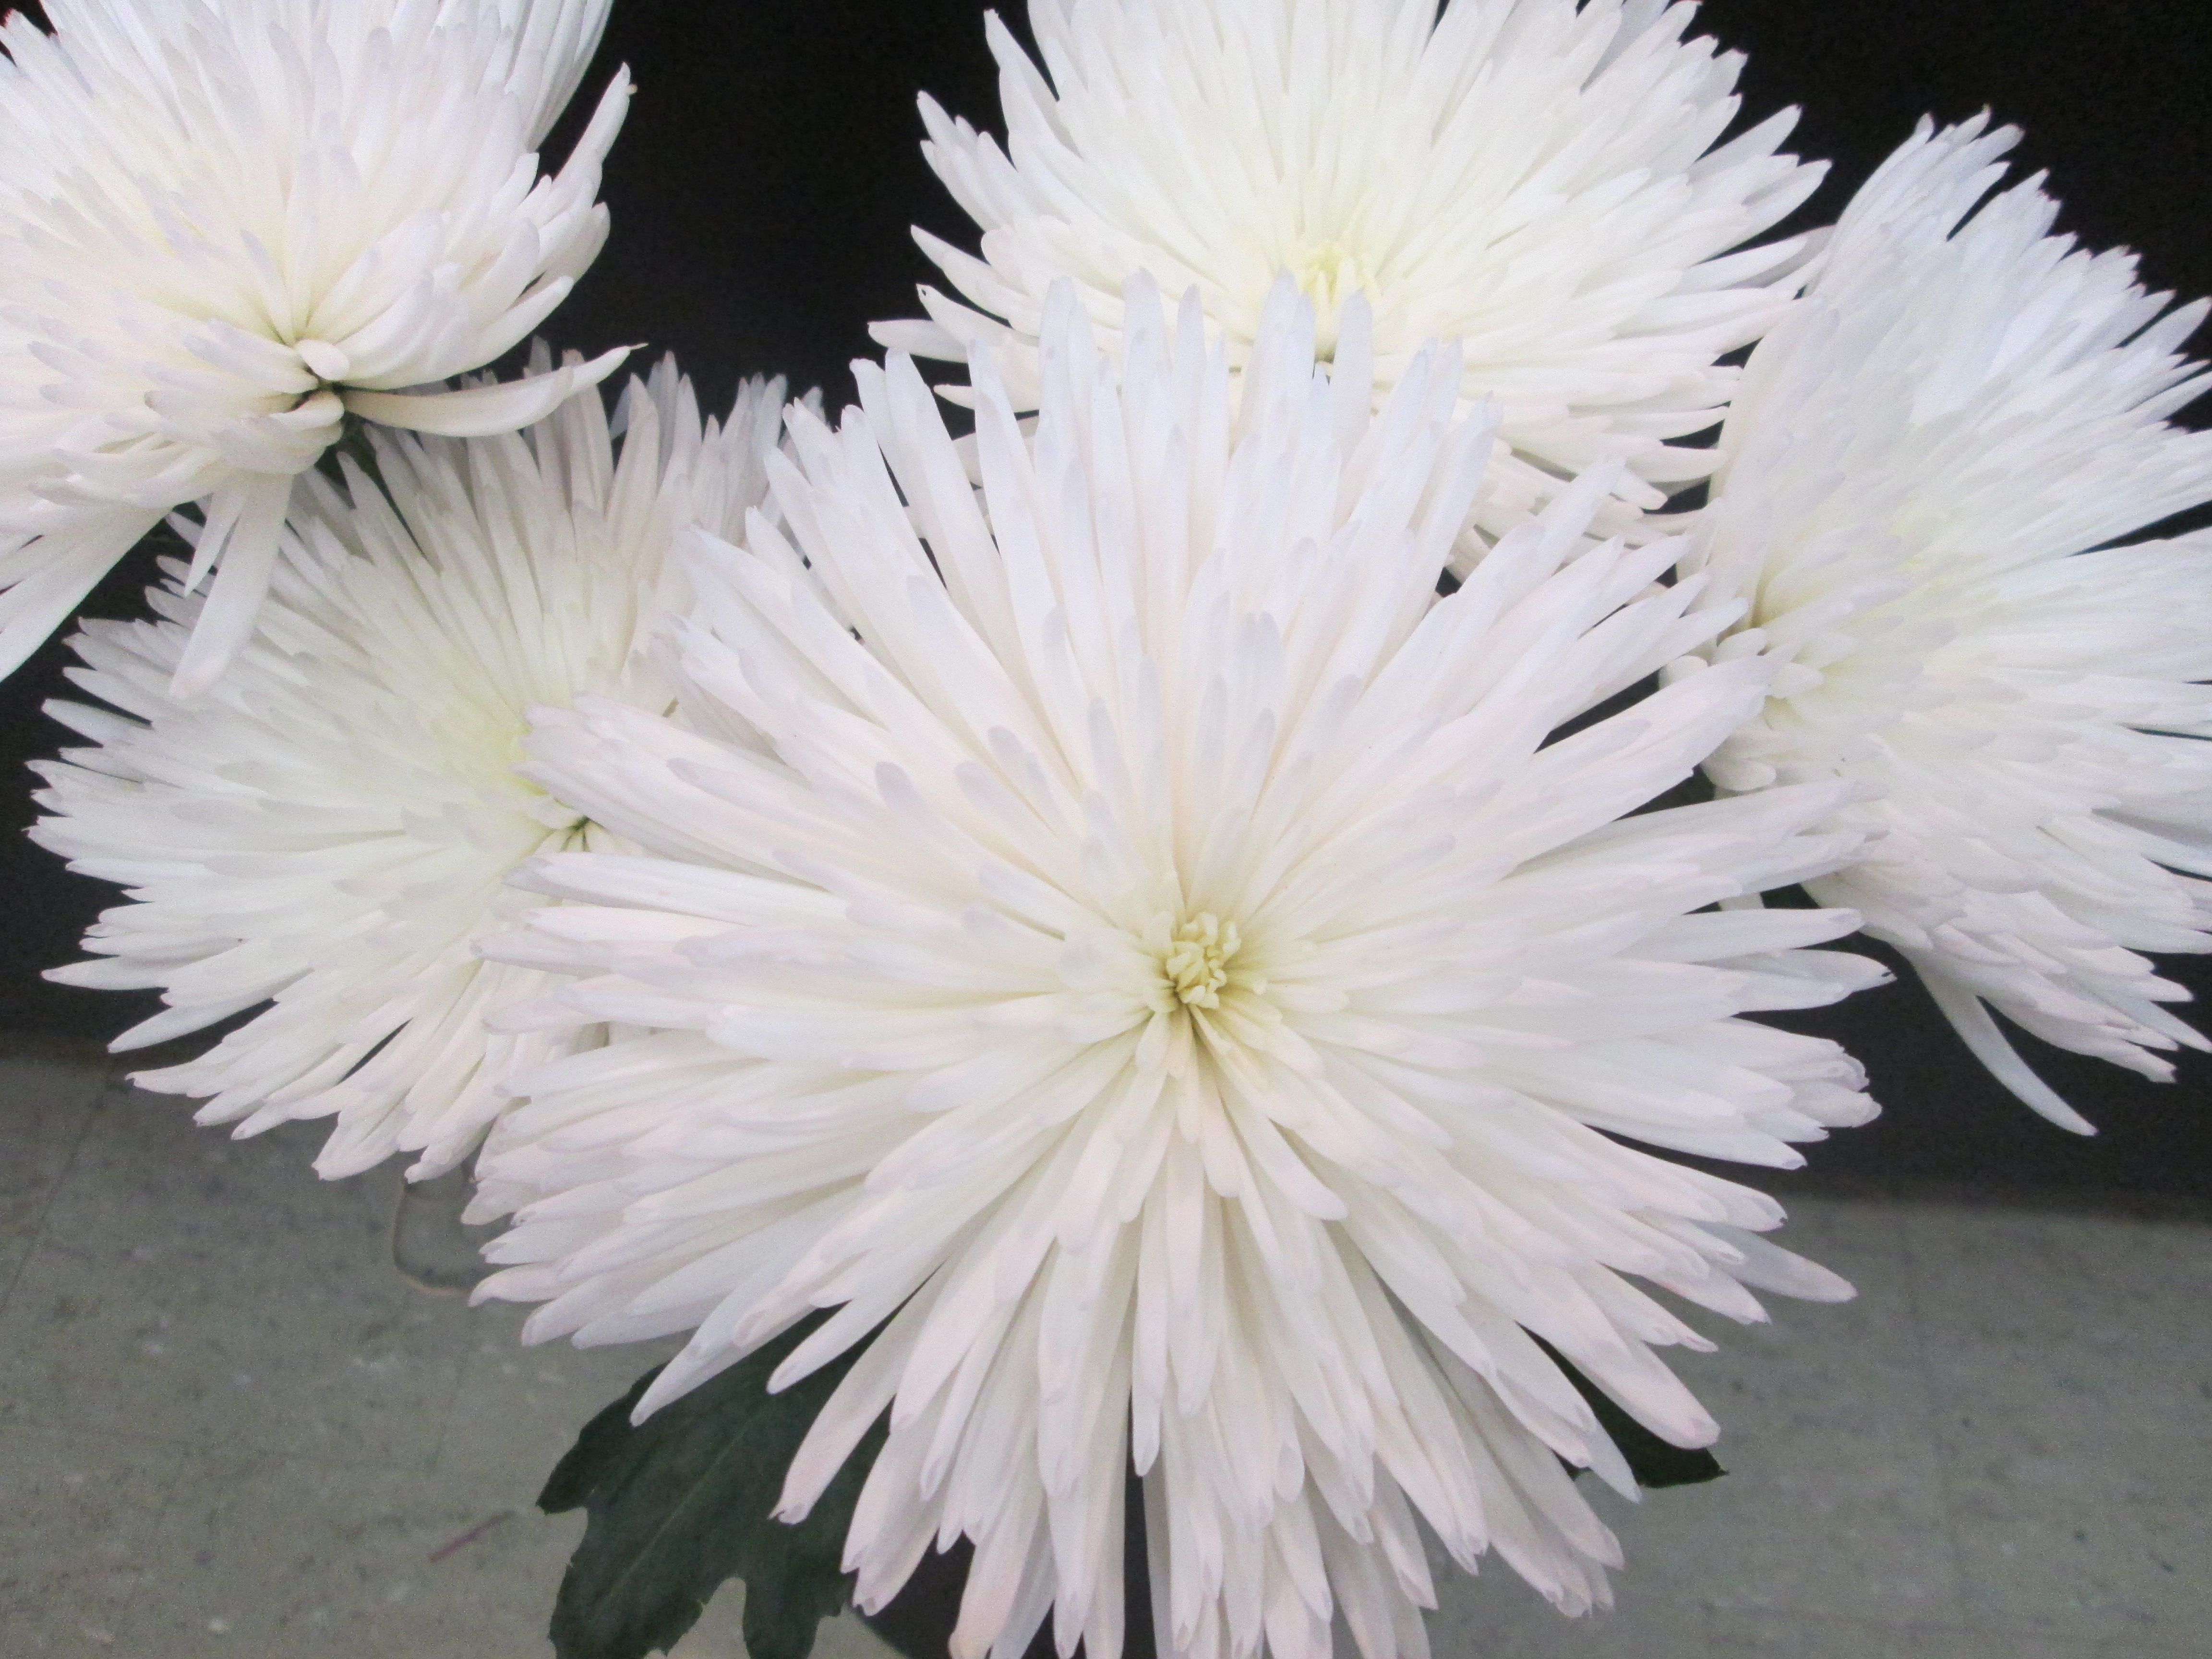 White Fuji Mums Google Search Dandelion Flower Flowers Mums Flowers